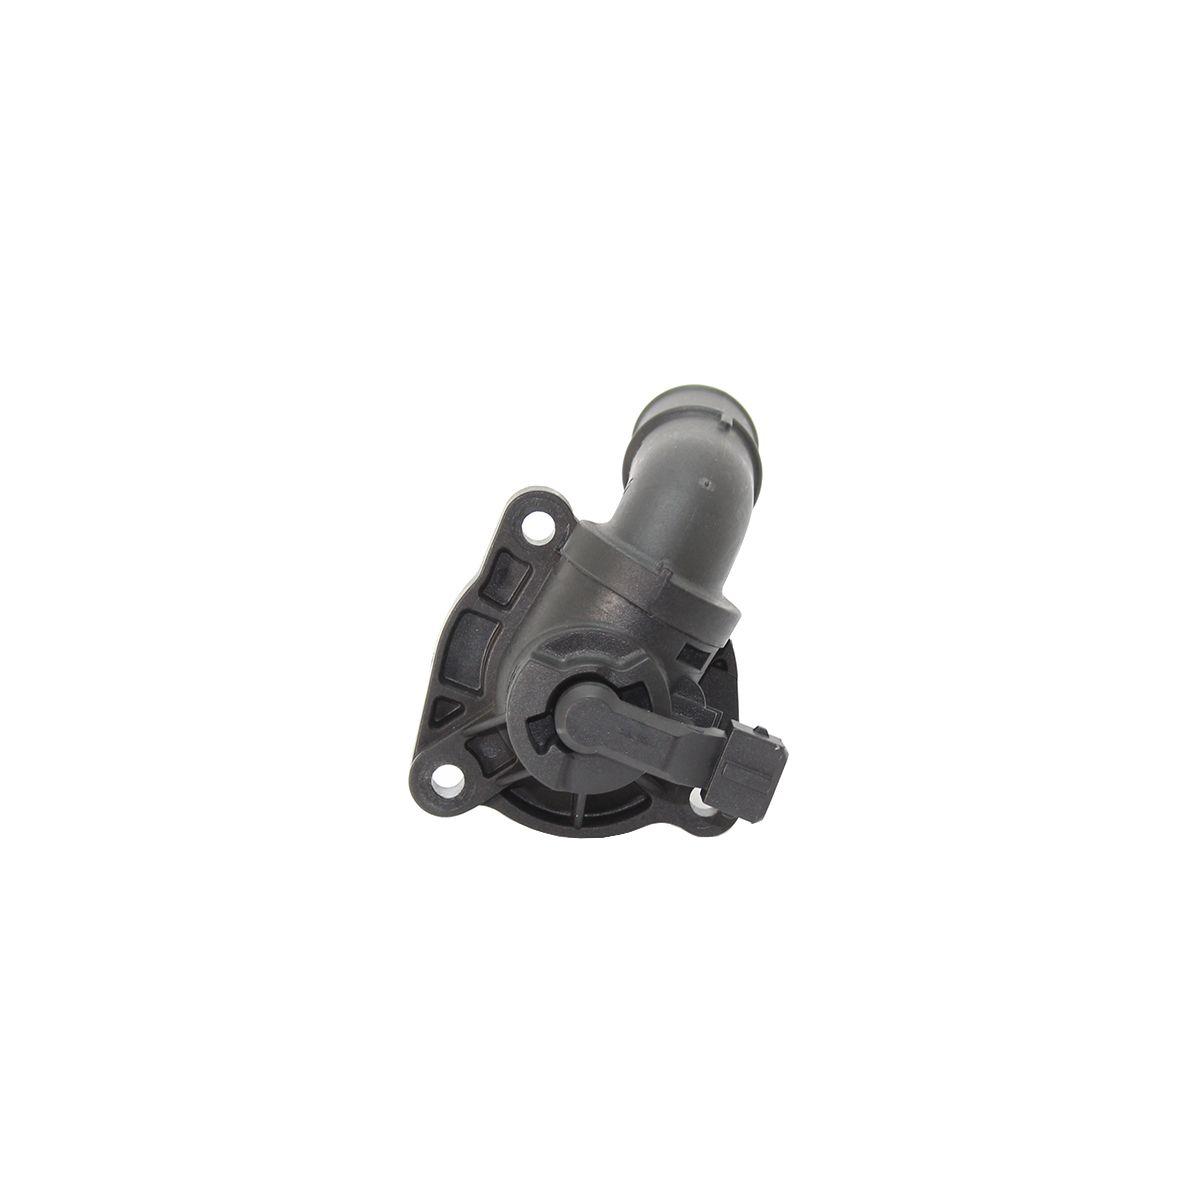 Válvula Termostátiva Ford Courrier 1.6 8V KA 1.0 1.6 8V 07/13 86BAA